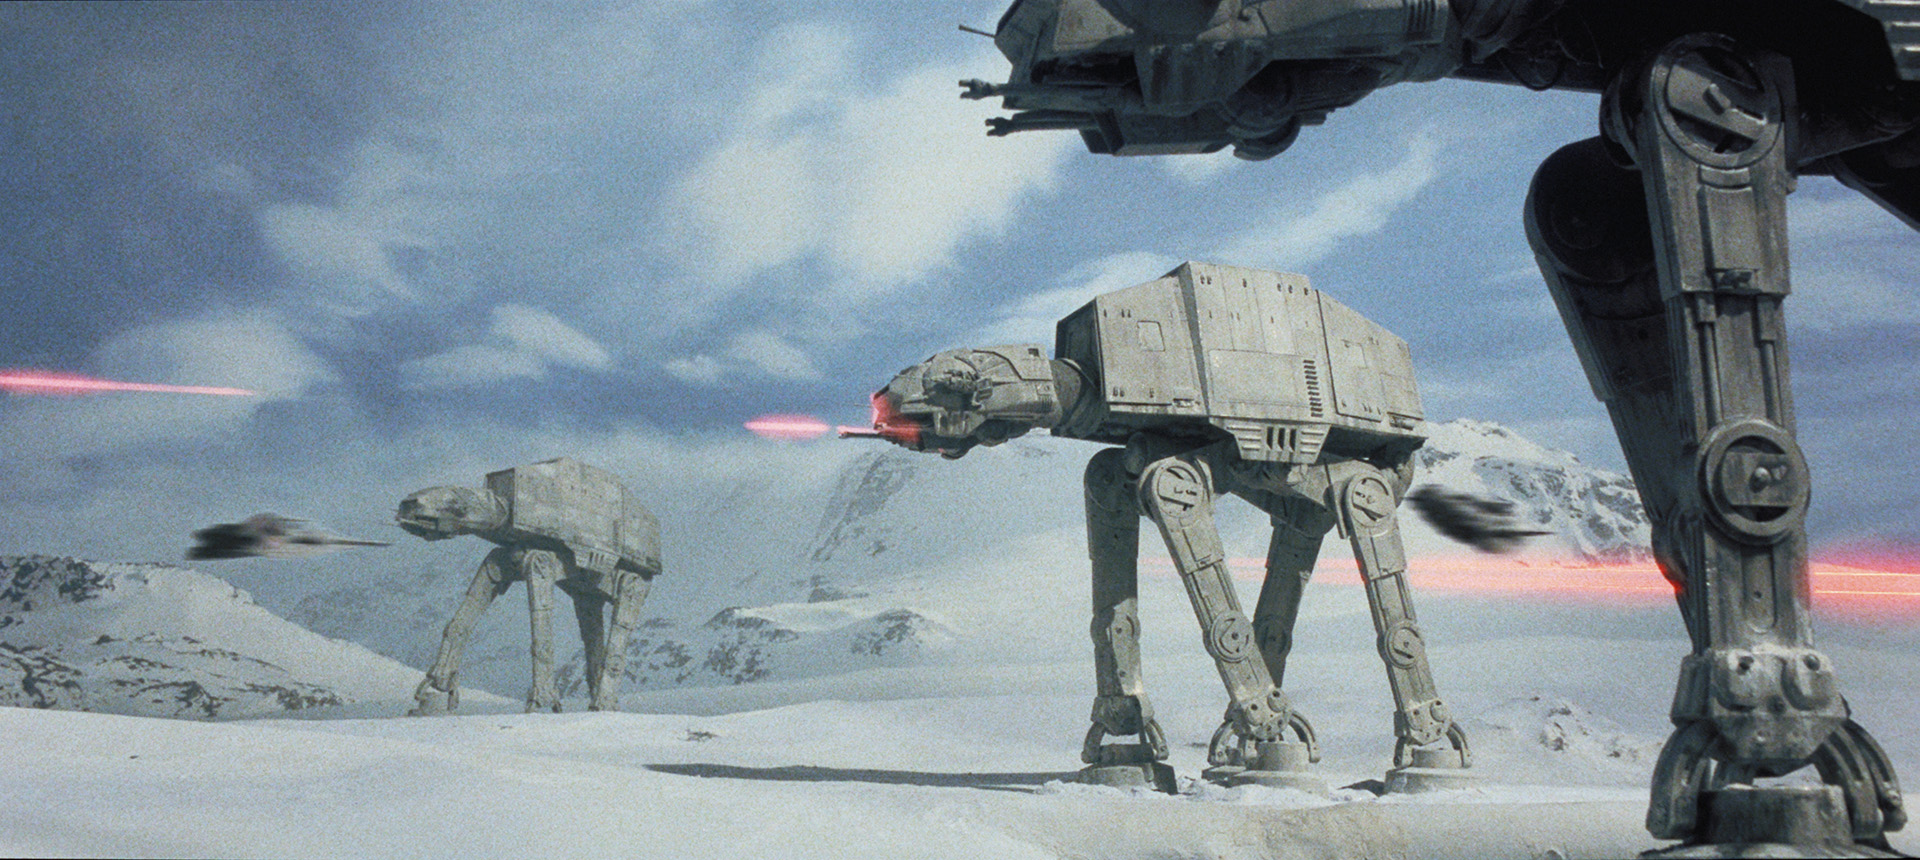 Star Wars Episode 5: The Empire Strikes Back | Lucasfilm.com